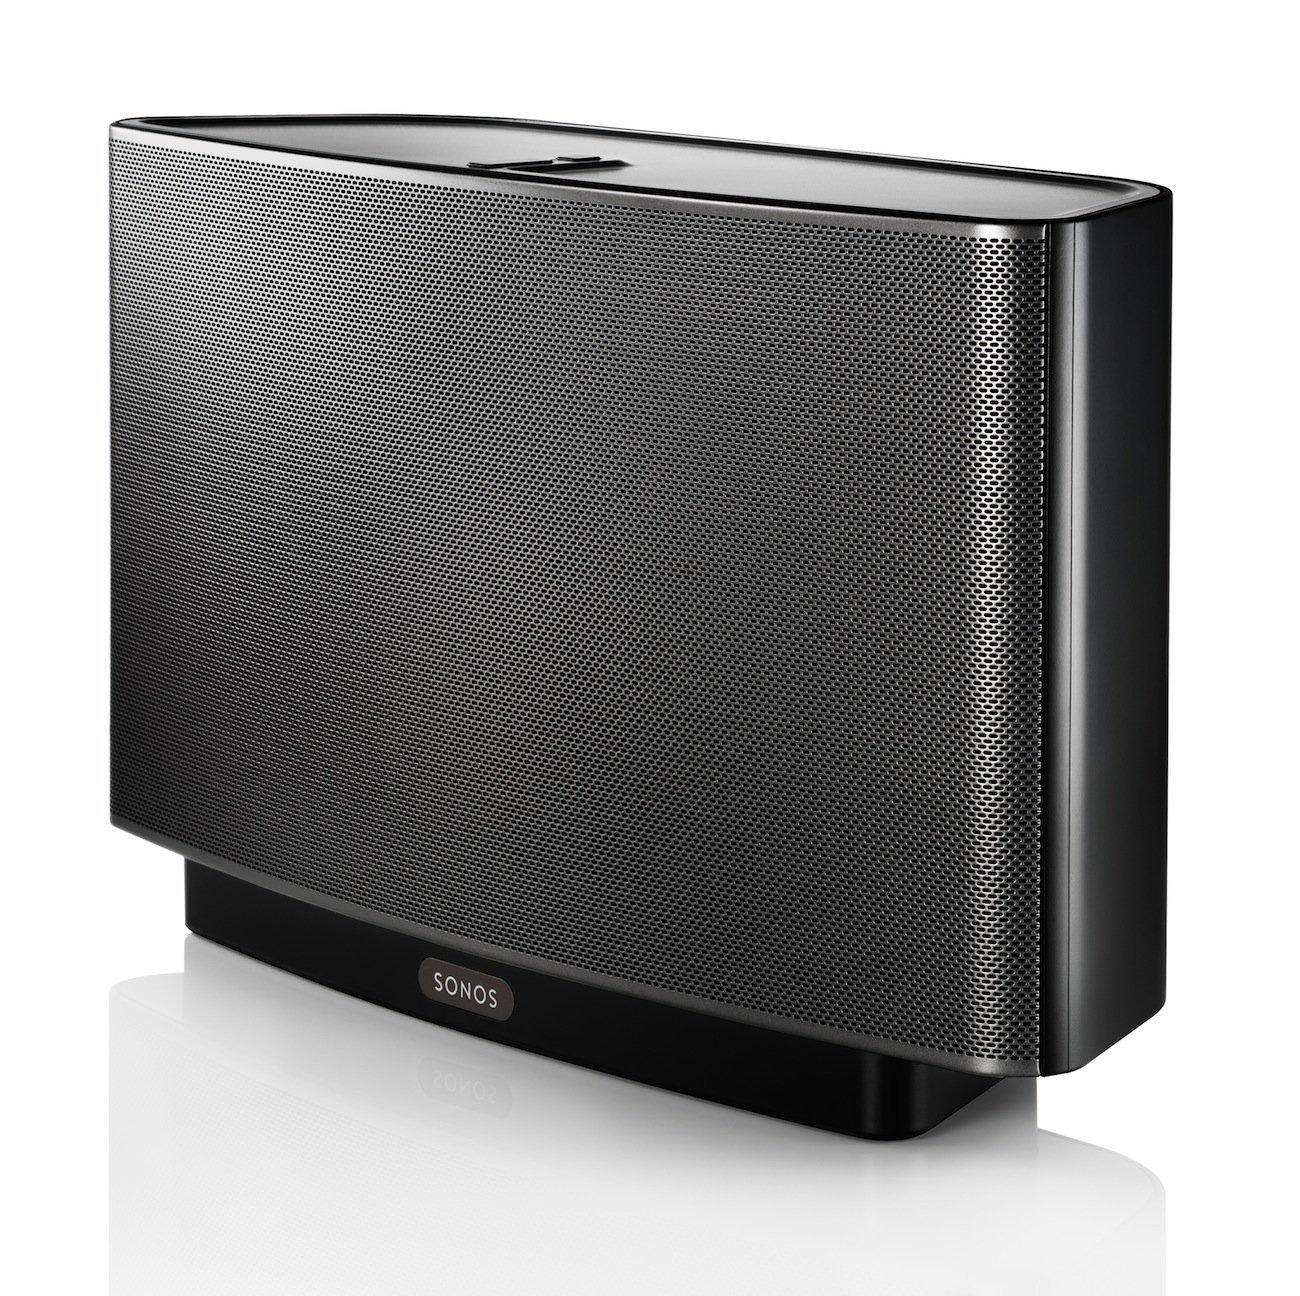 Sonos Play 5 Wireless Speaker for Streaming Music - Black (Certified Refurbished)